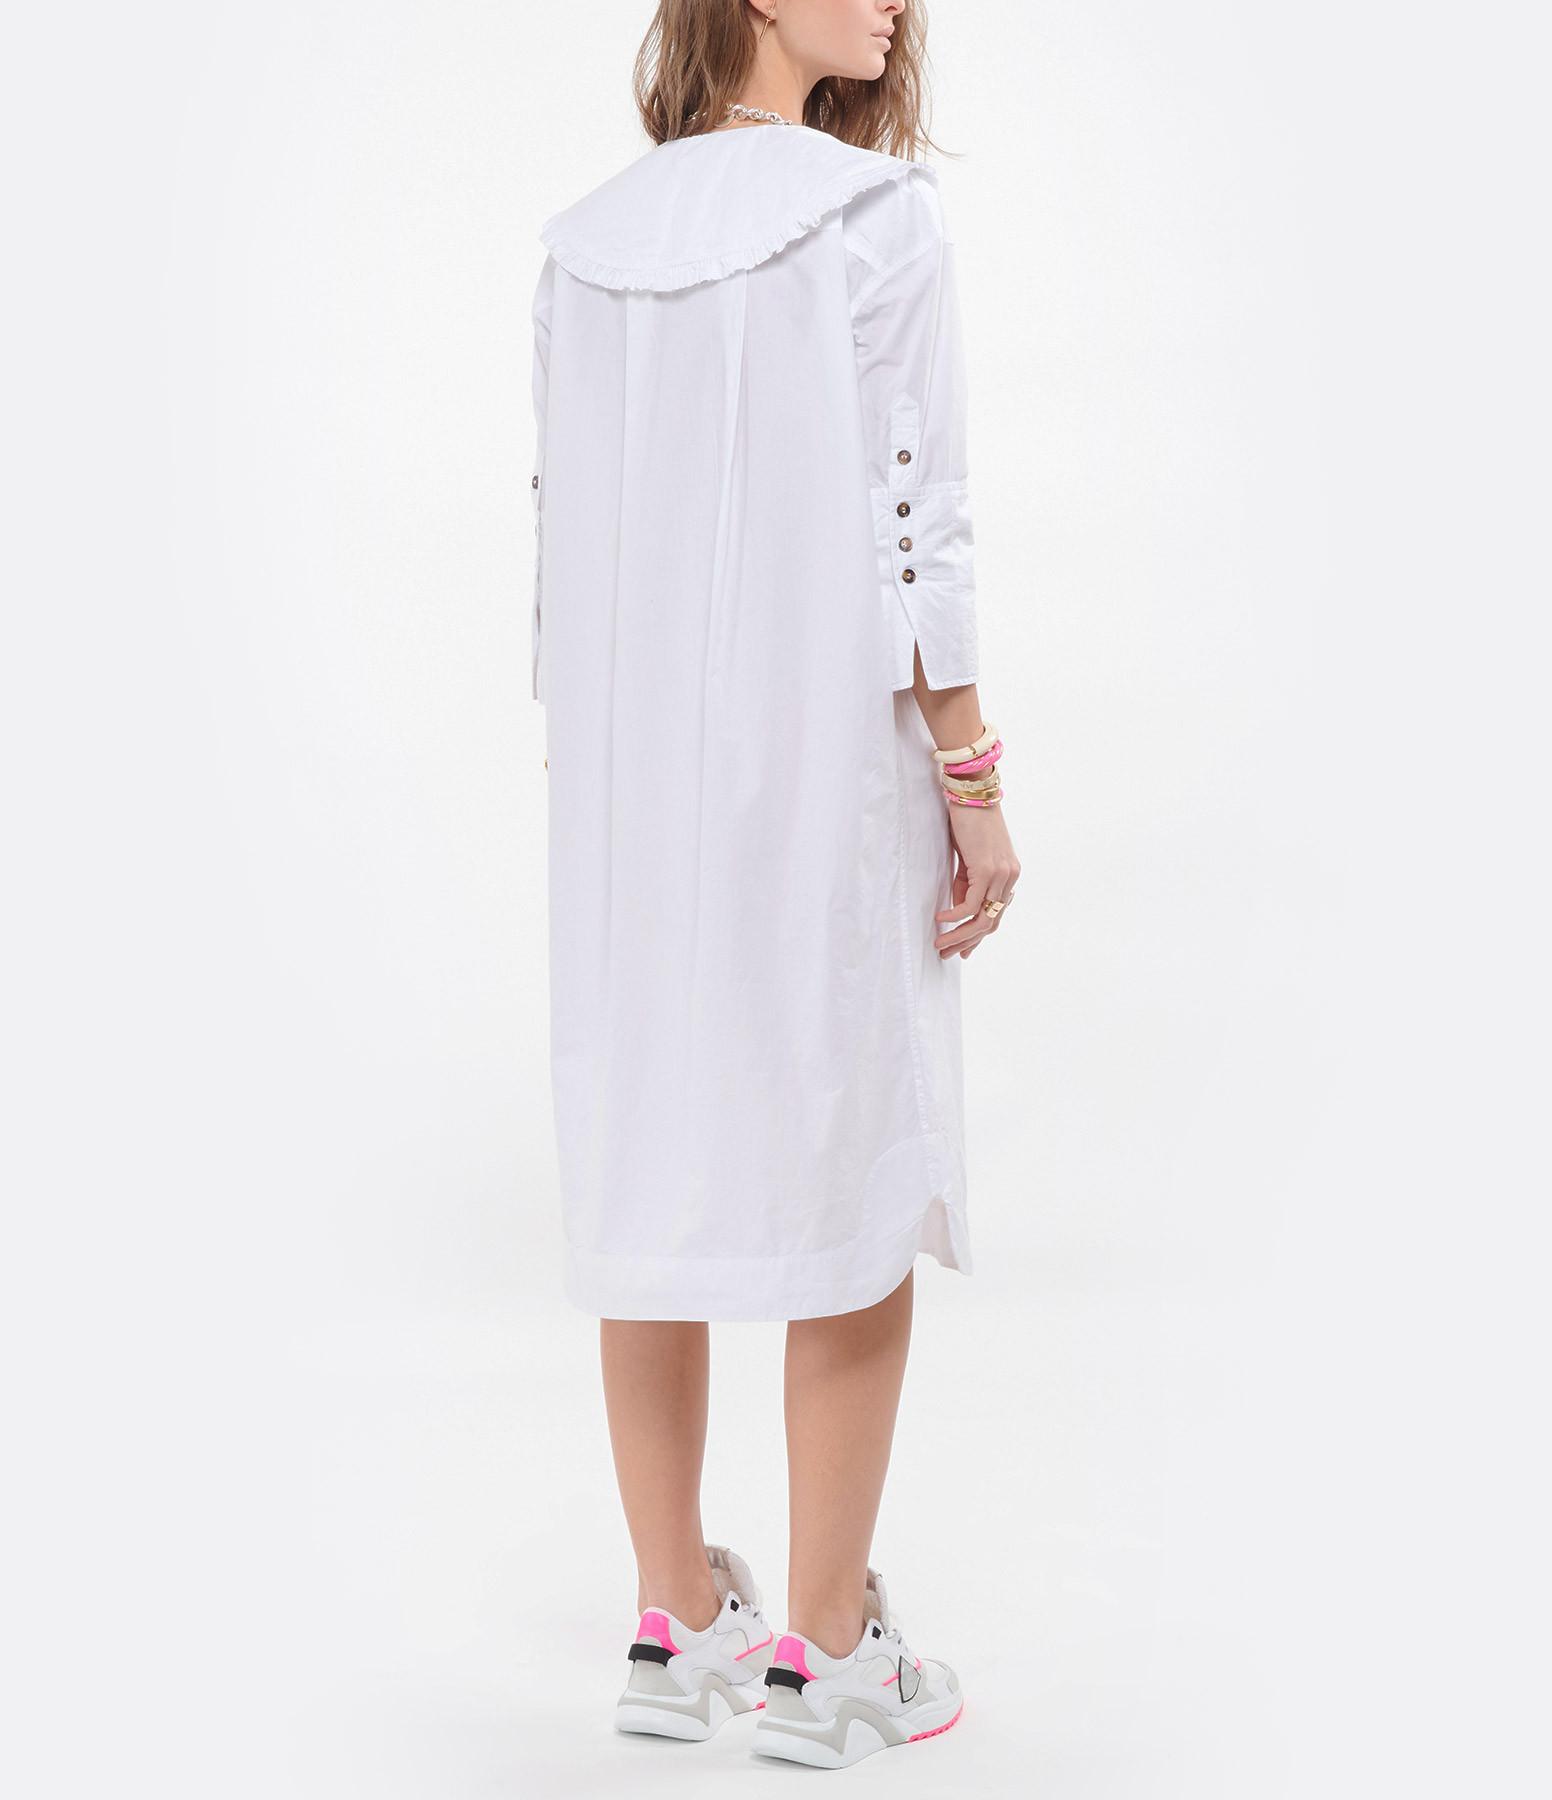 GANNI - Robe Chemise Coton Popline Blanc